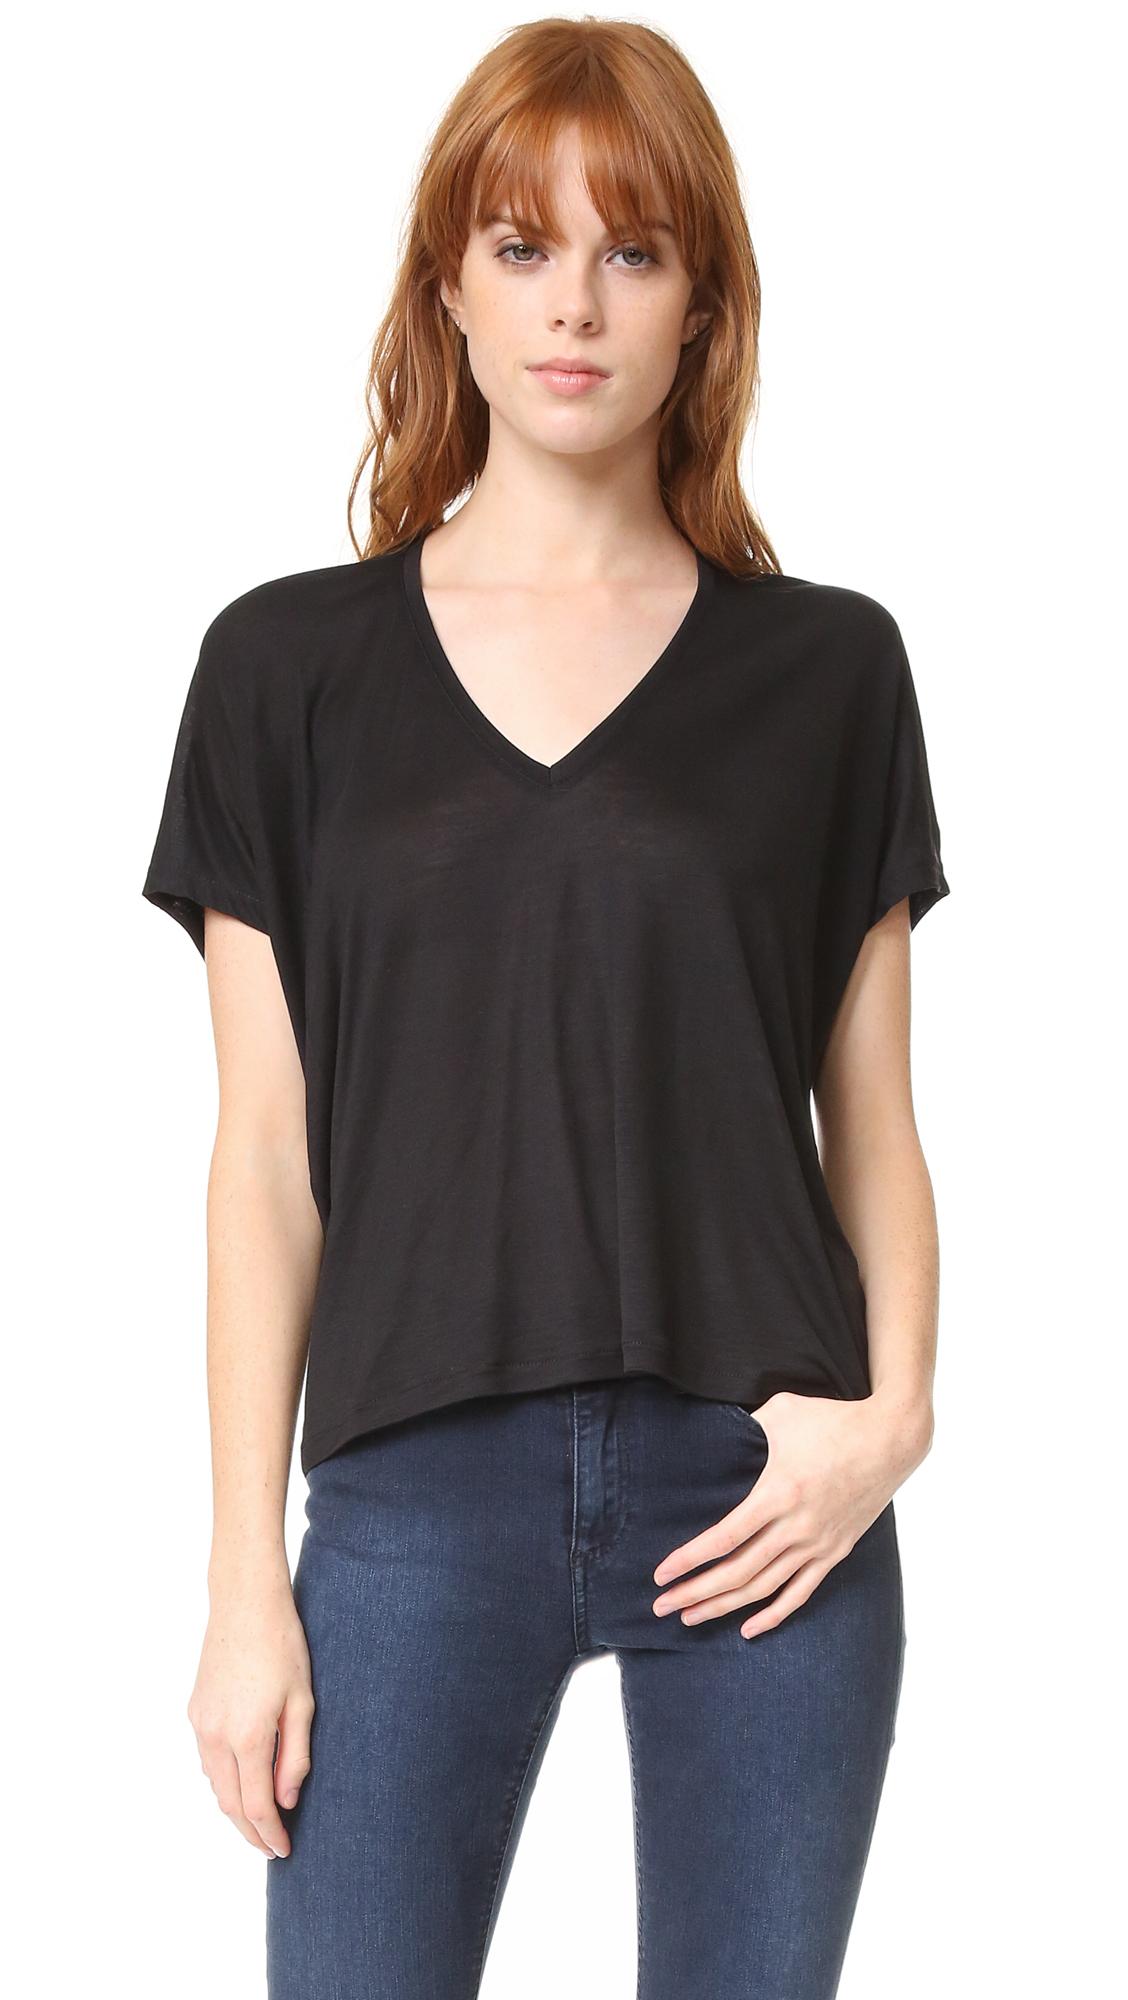 Acne Studios Kileo T-Shirt - Black at Shopbop